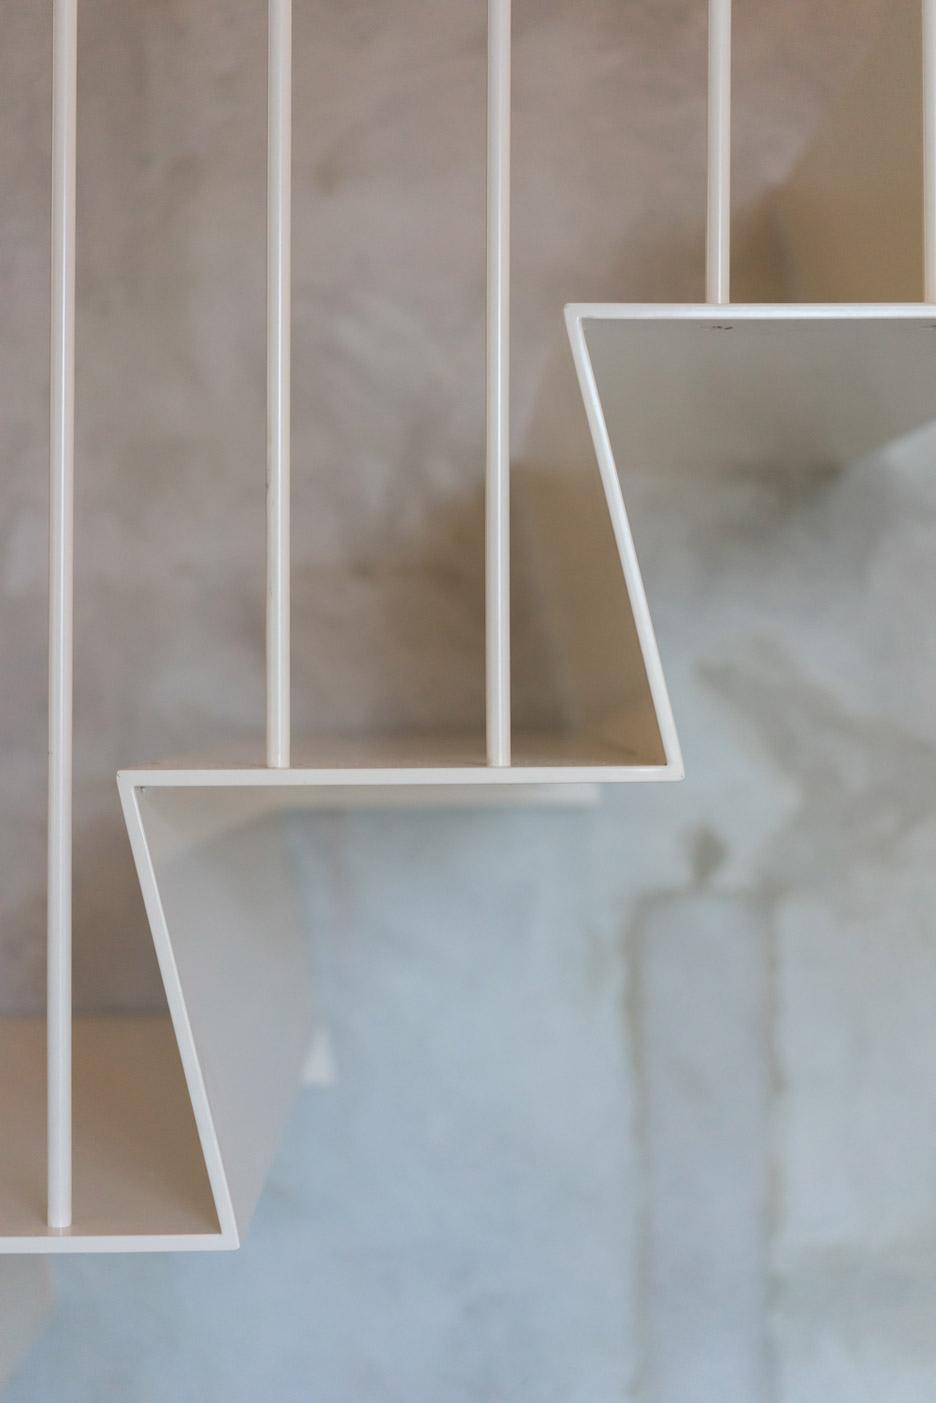 architecture-design-studia-interiors-osnovadesign-osnova-ukraine-poltava-kyev-dnepropetrovsk-kharkov-odessa-lviv-poltava-07